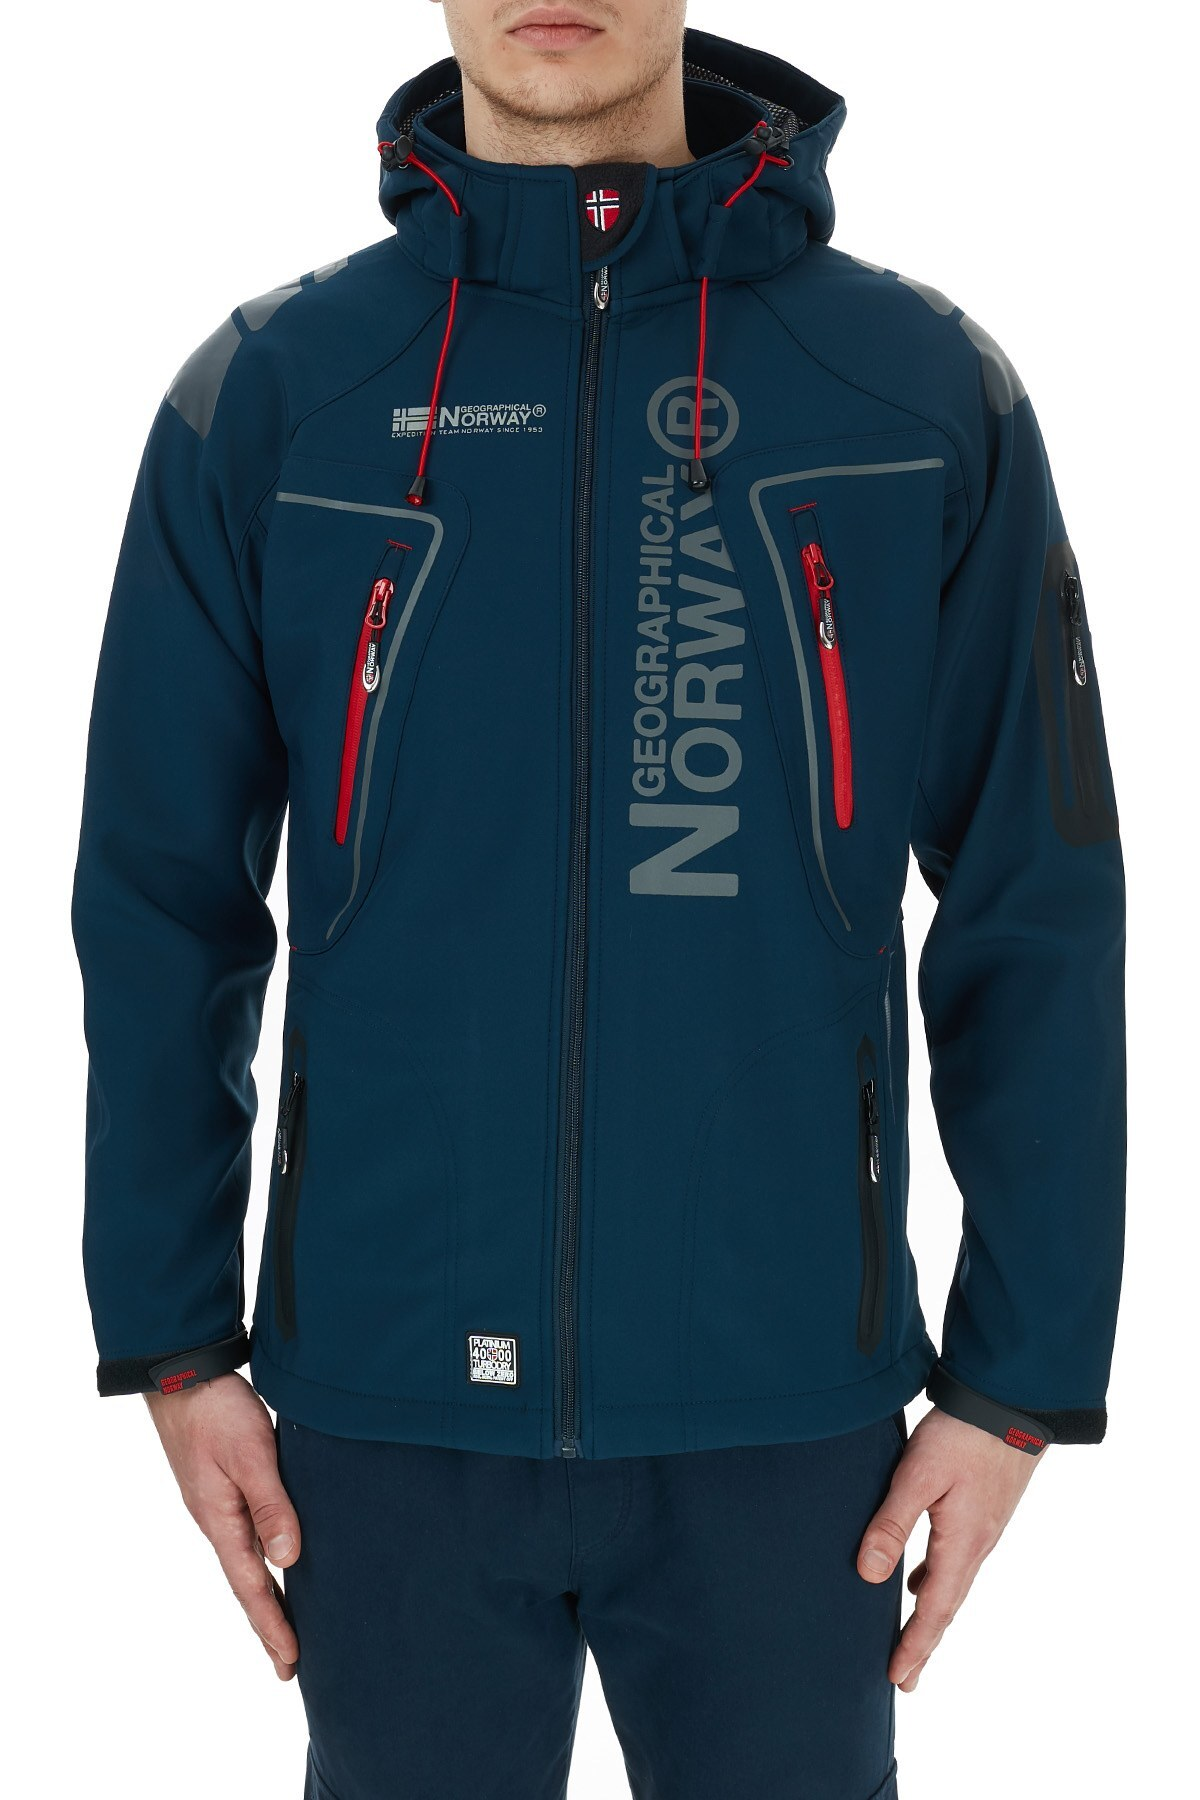 Norway Geographical Outdoor Erkek Mont TECHNO LACİVERT